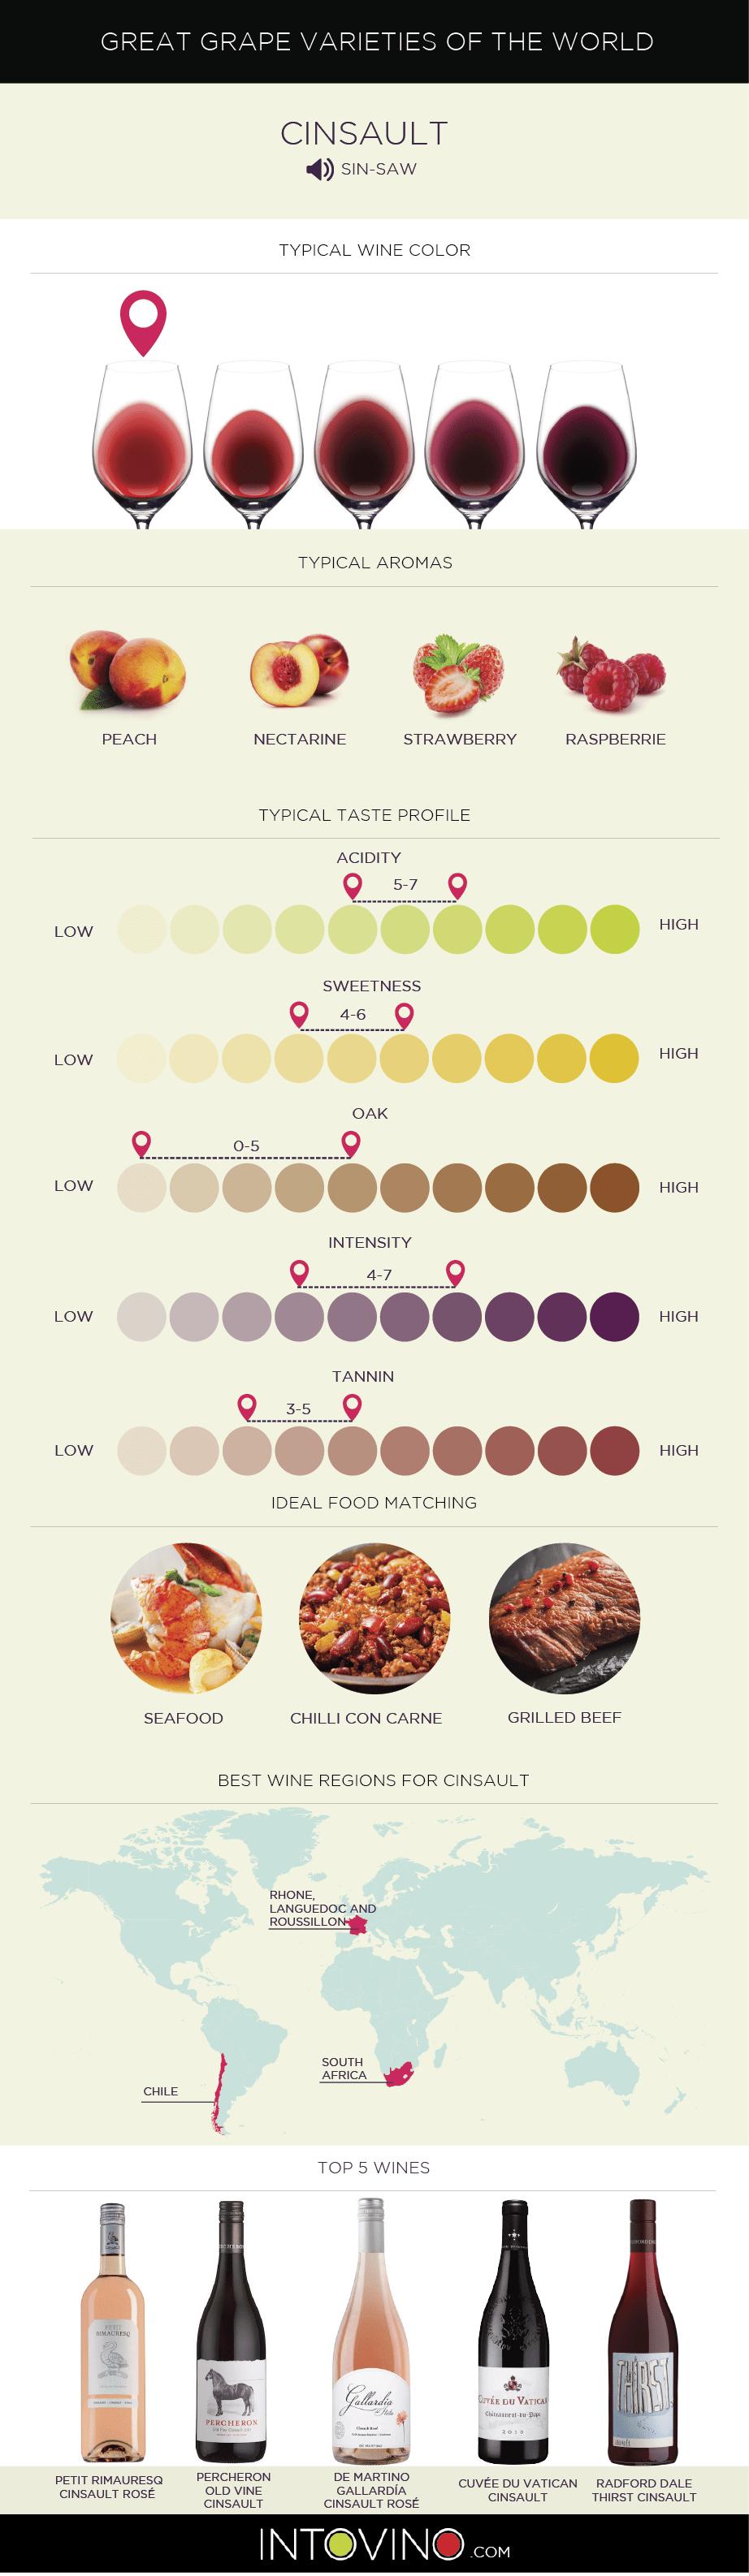 Cinsault wine Grape Variety